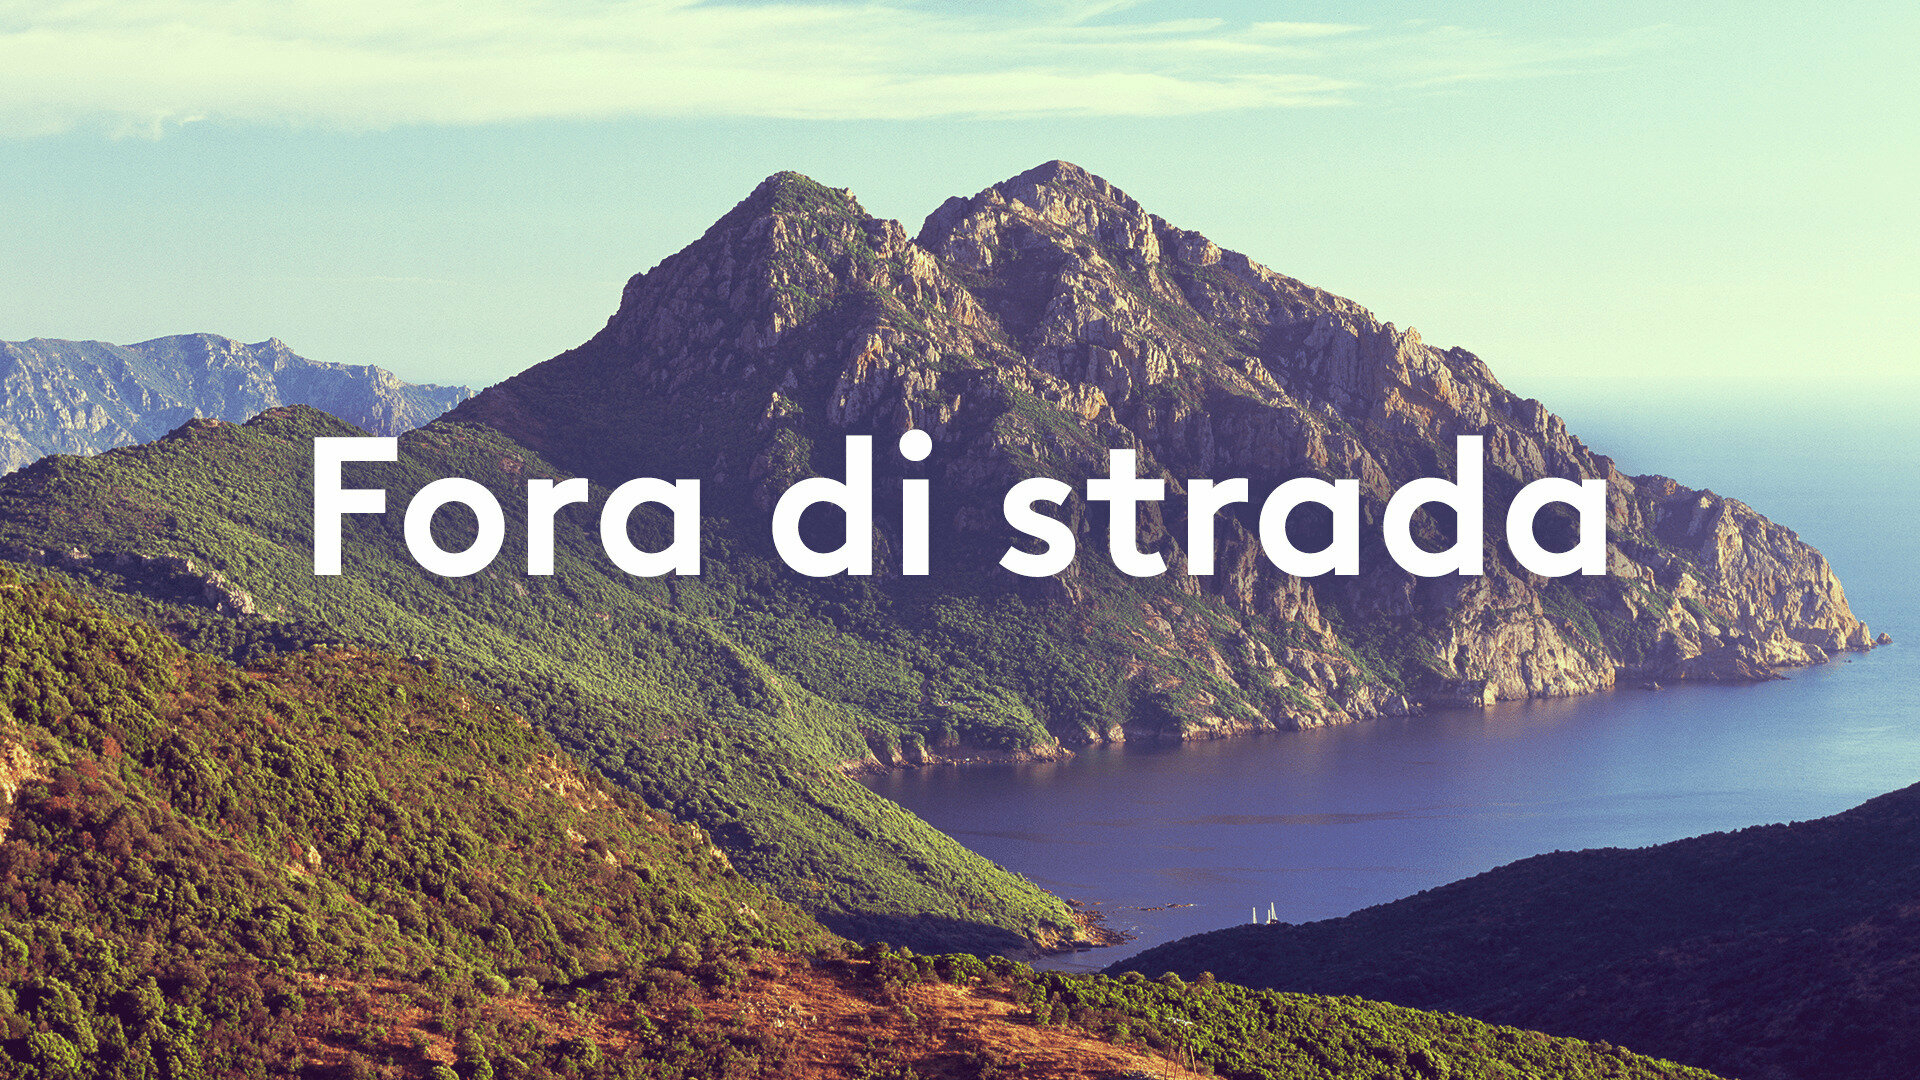 Fora di Strada : On a gravi l'Etna